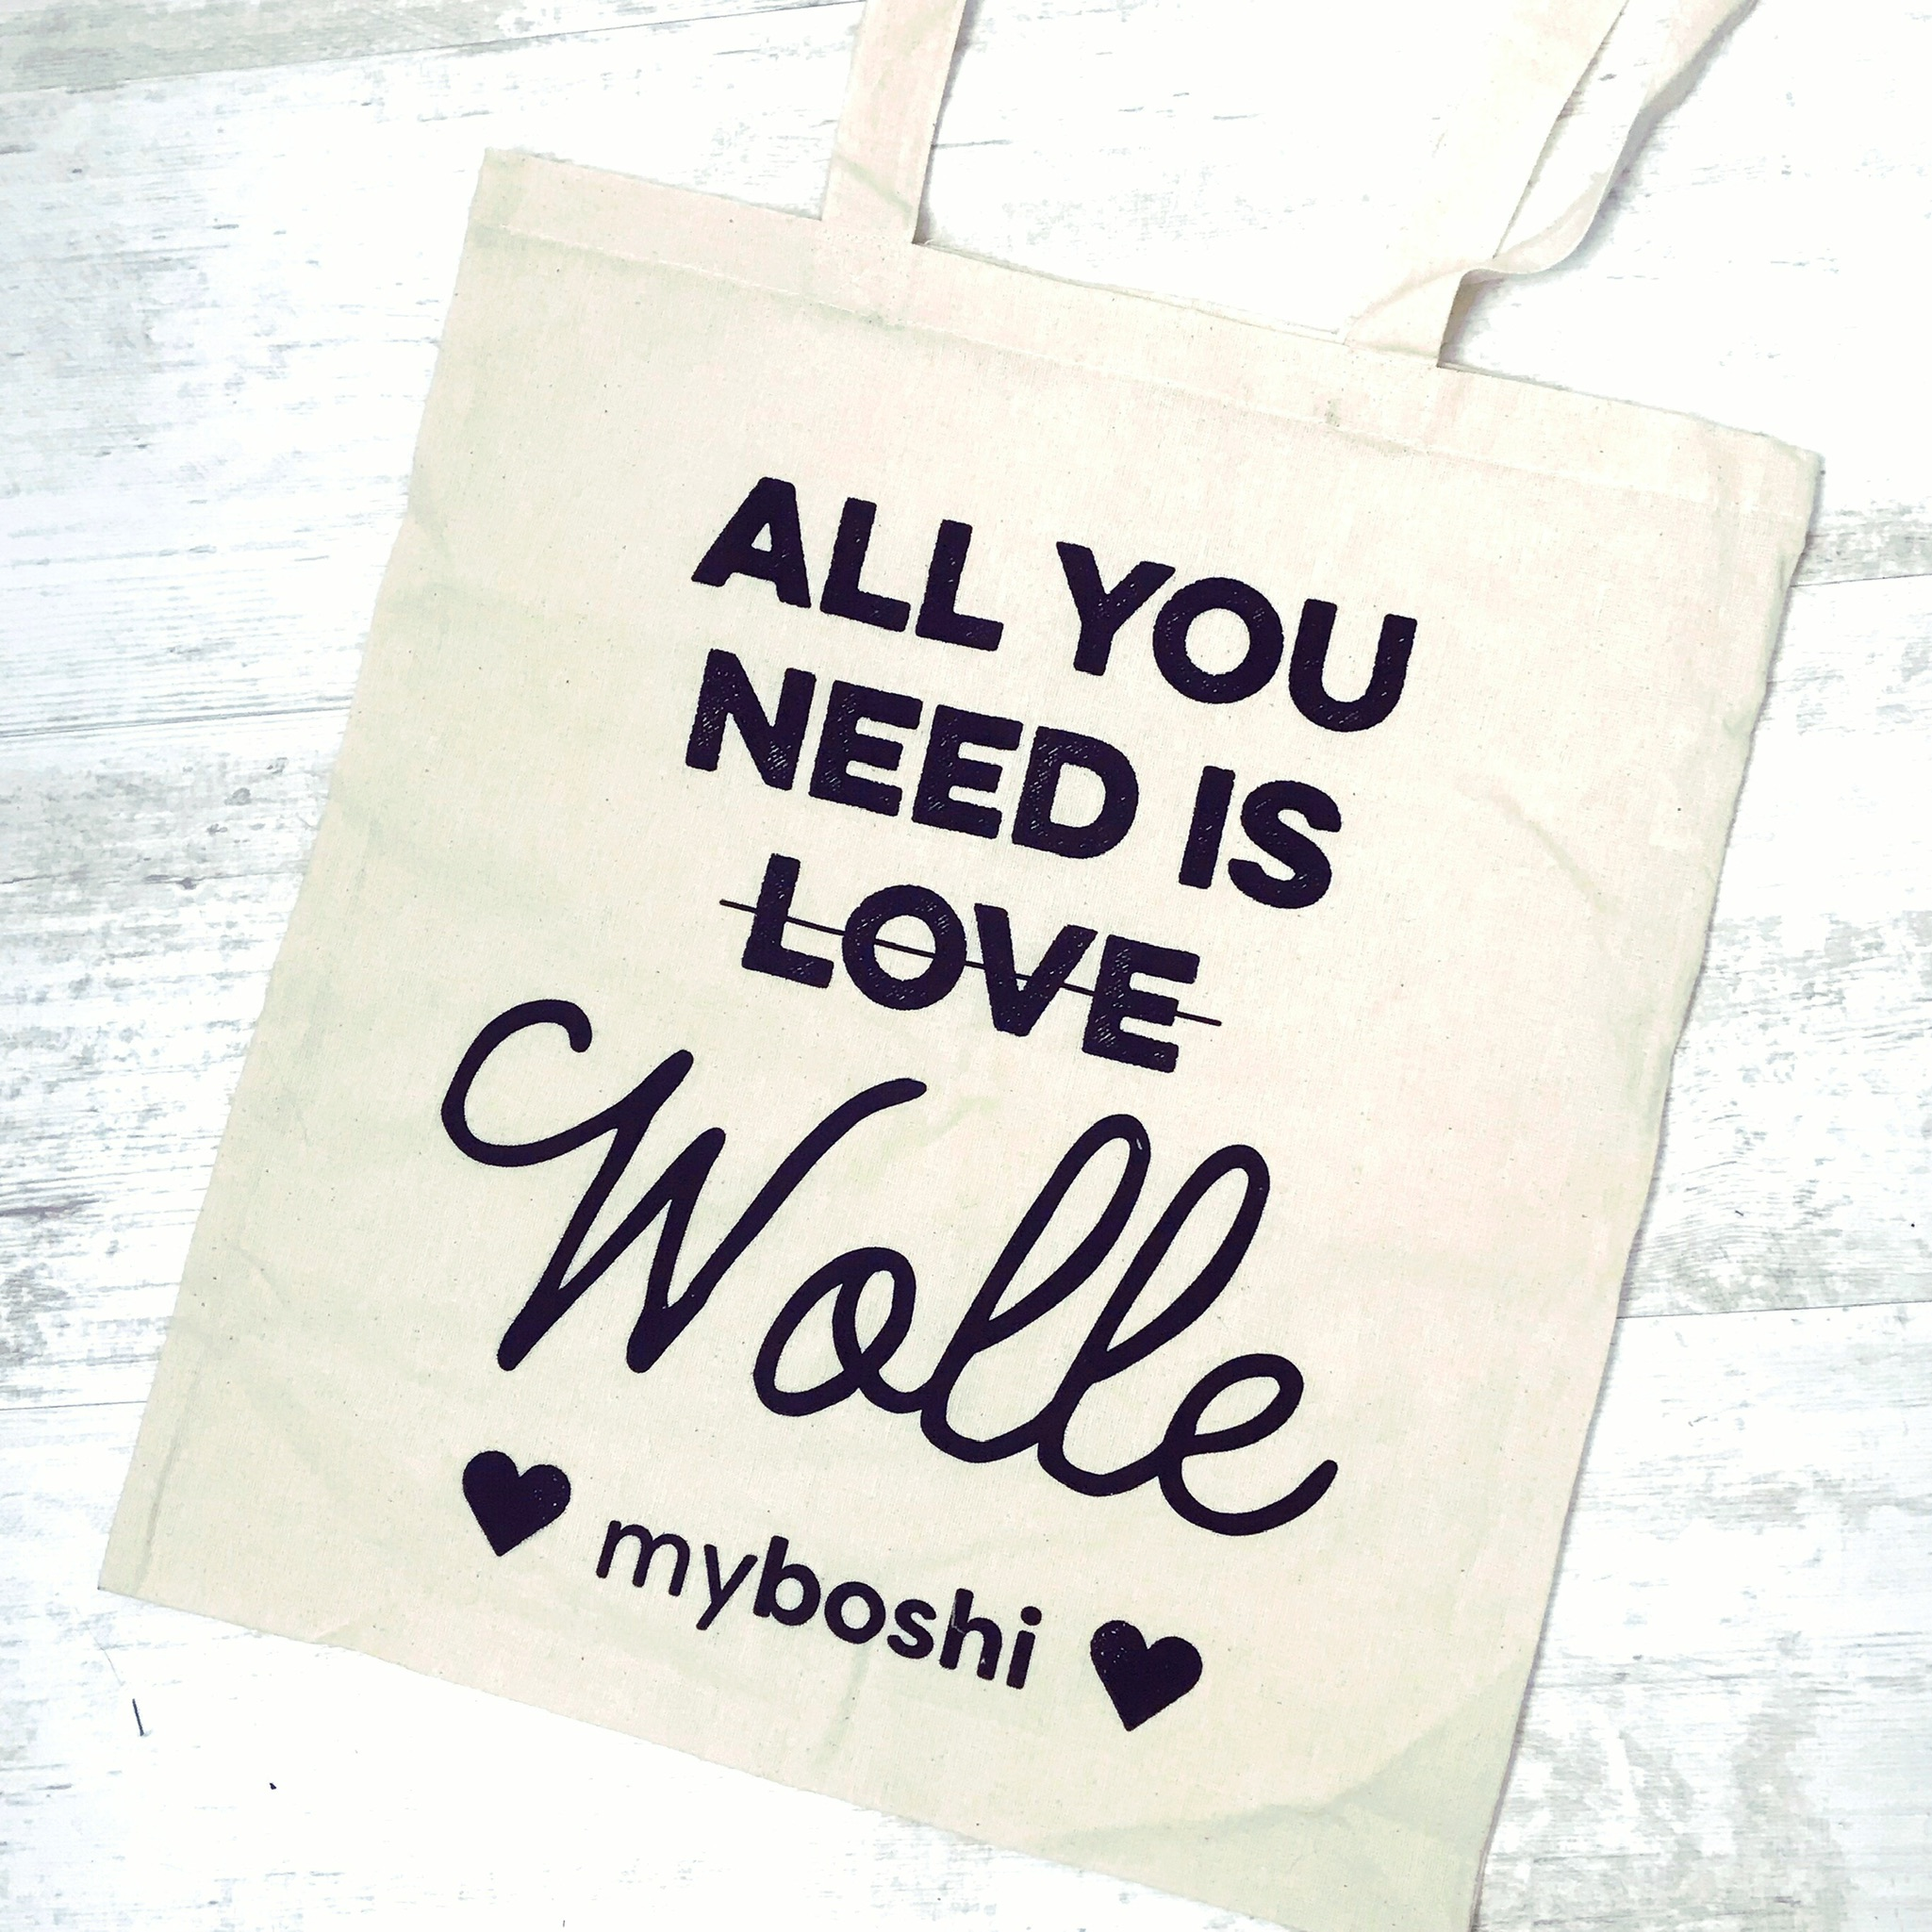 myboshi Leinentasche All you need is Wolle